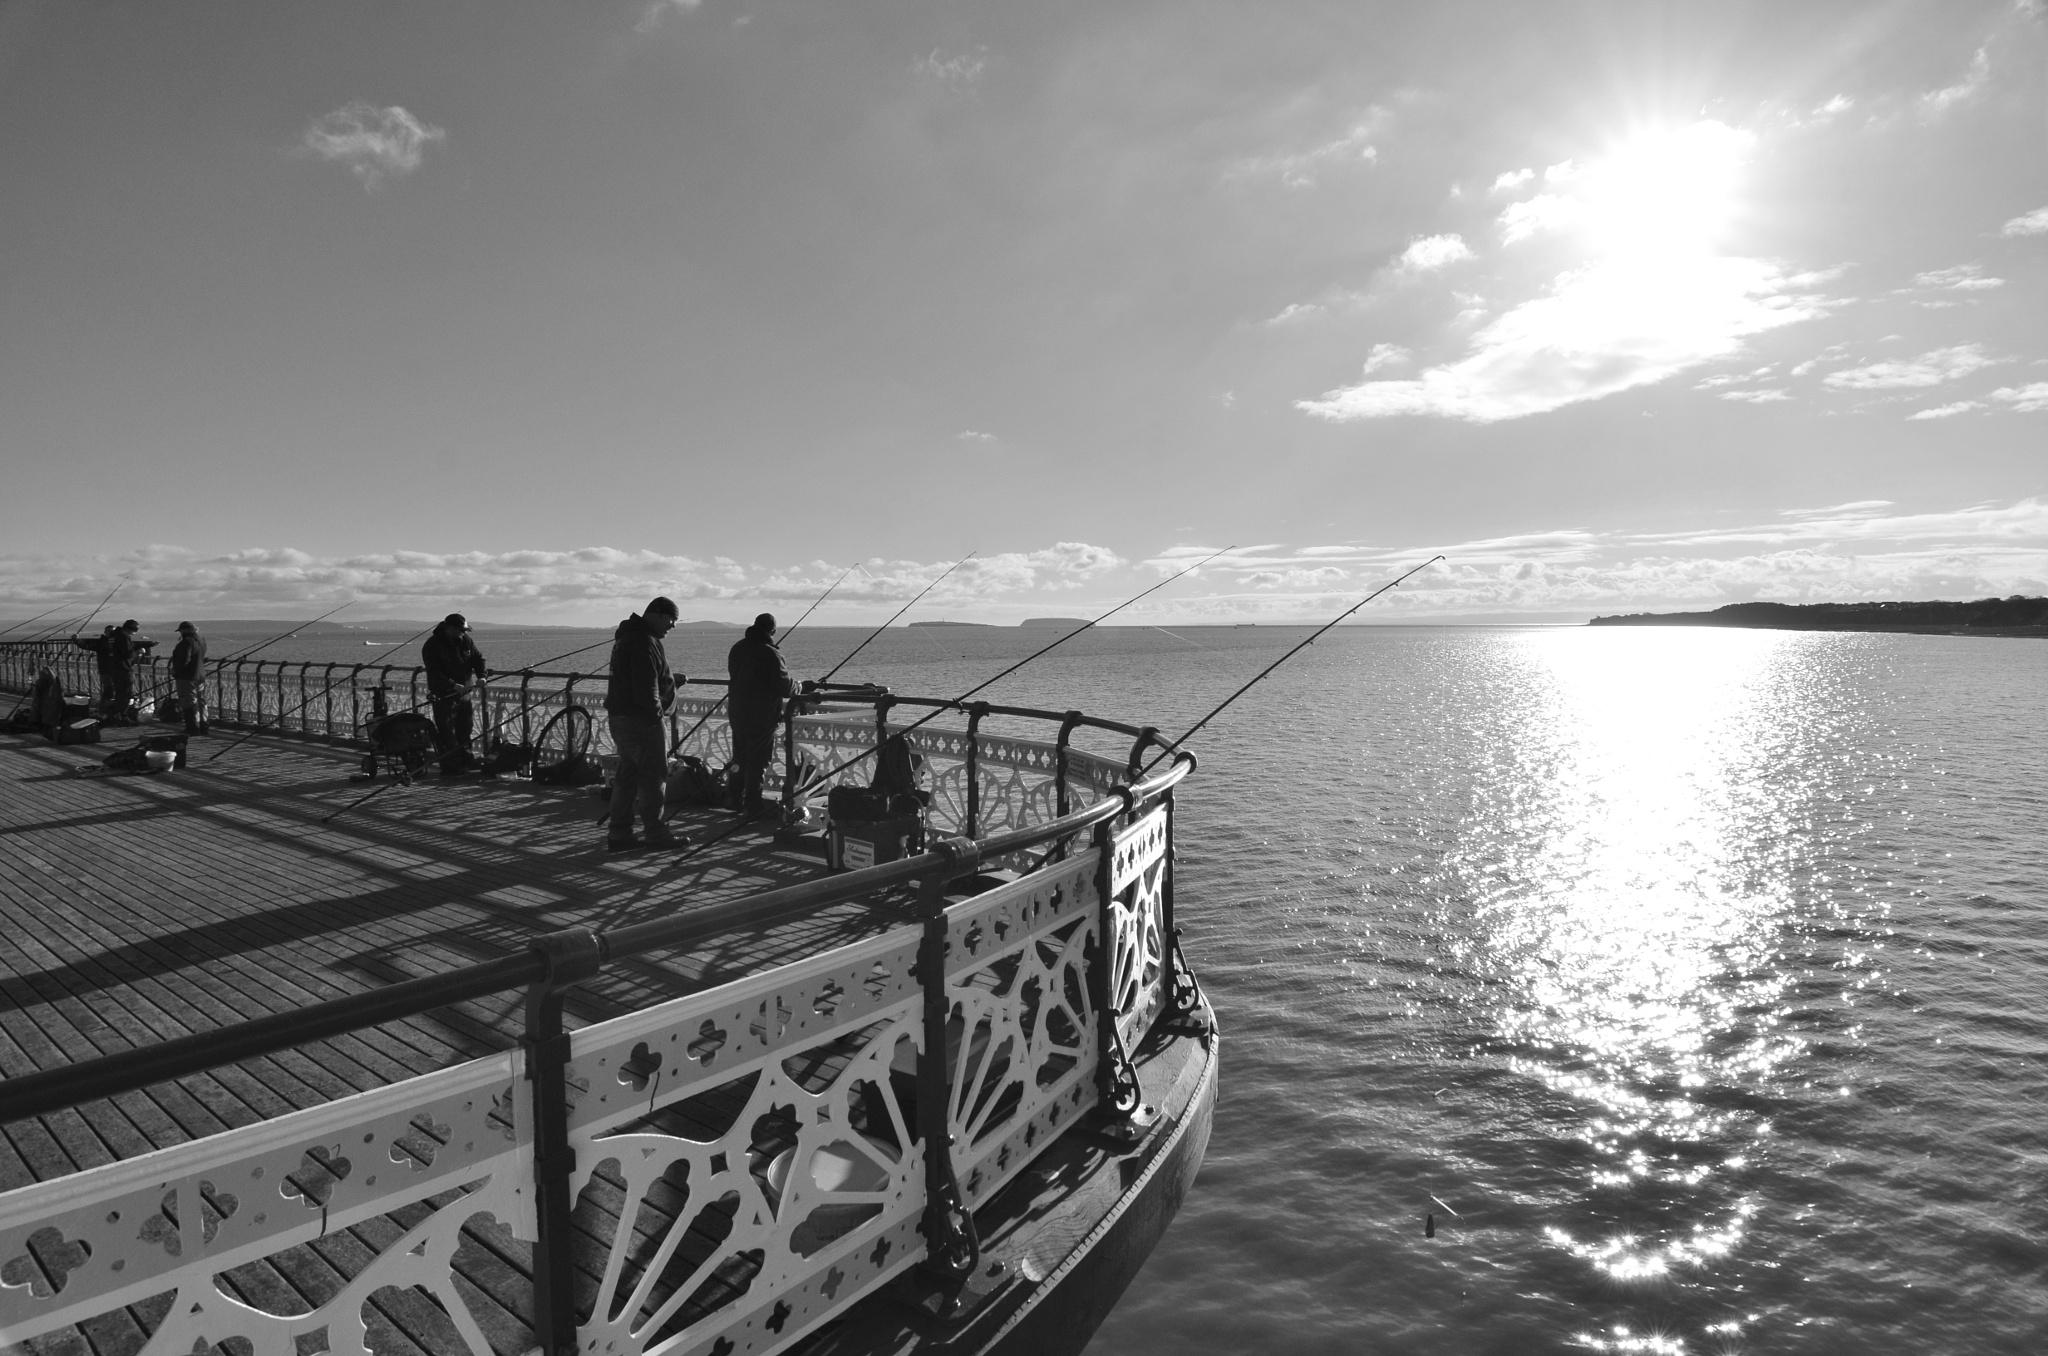 Fishing on the Pier by melaniehartshorn40